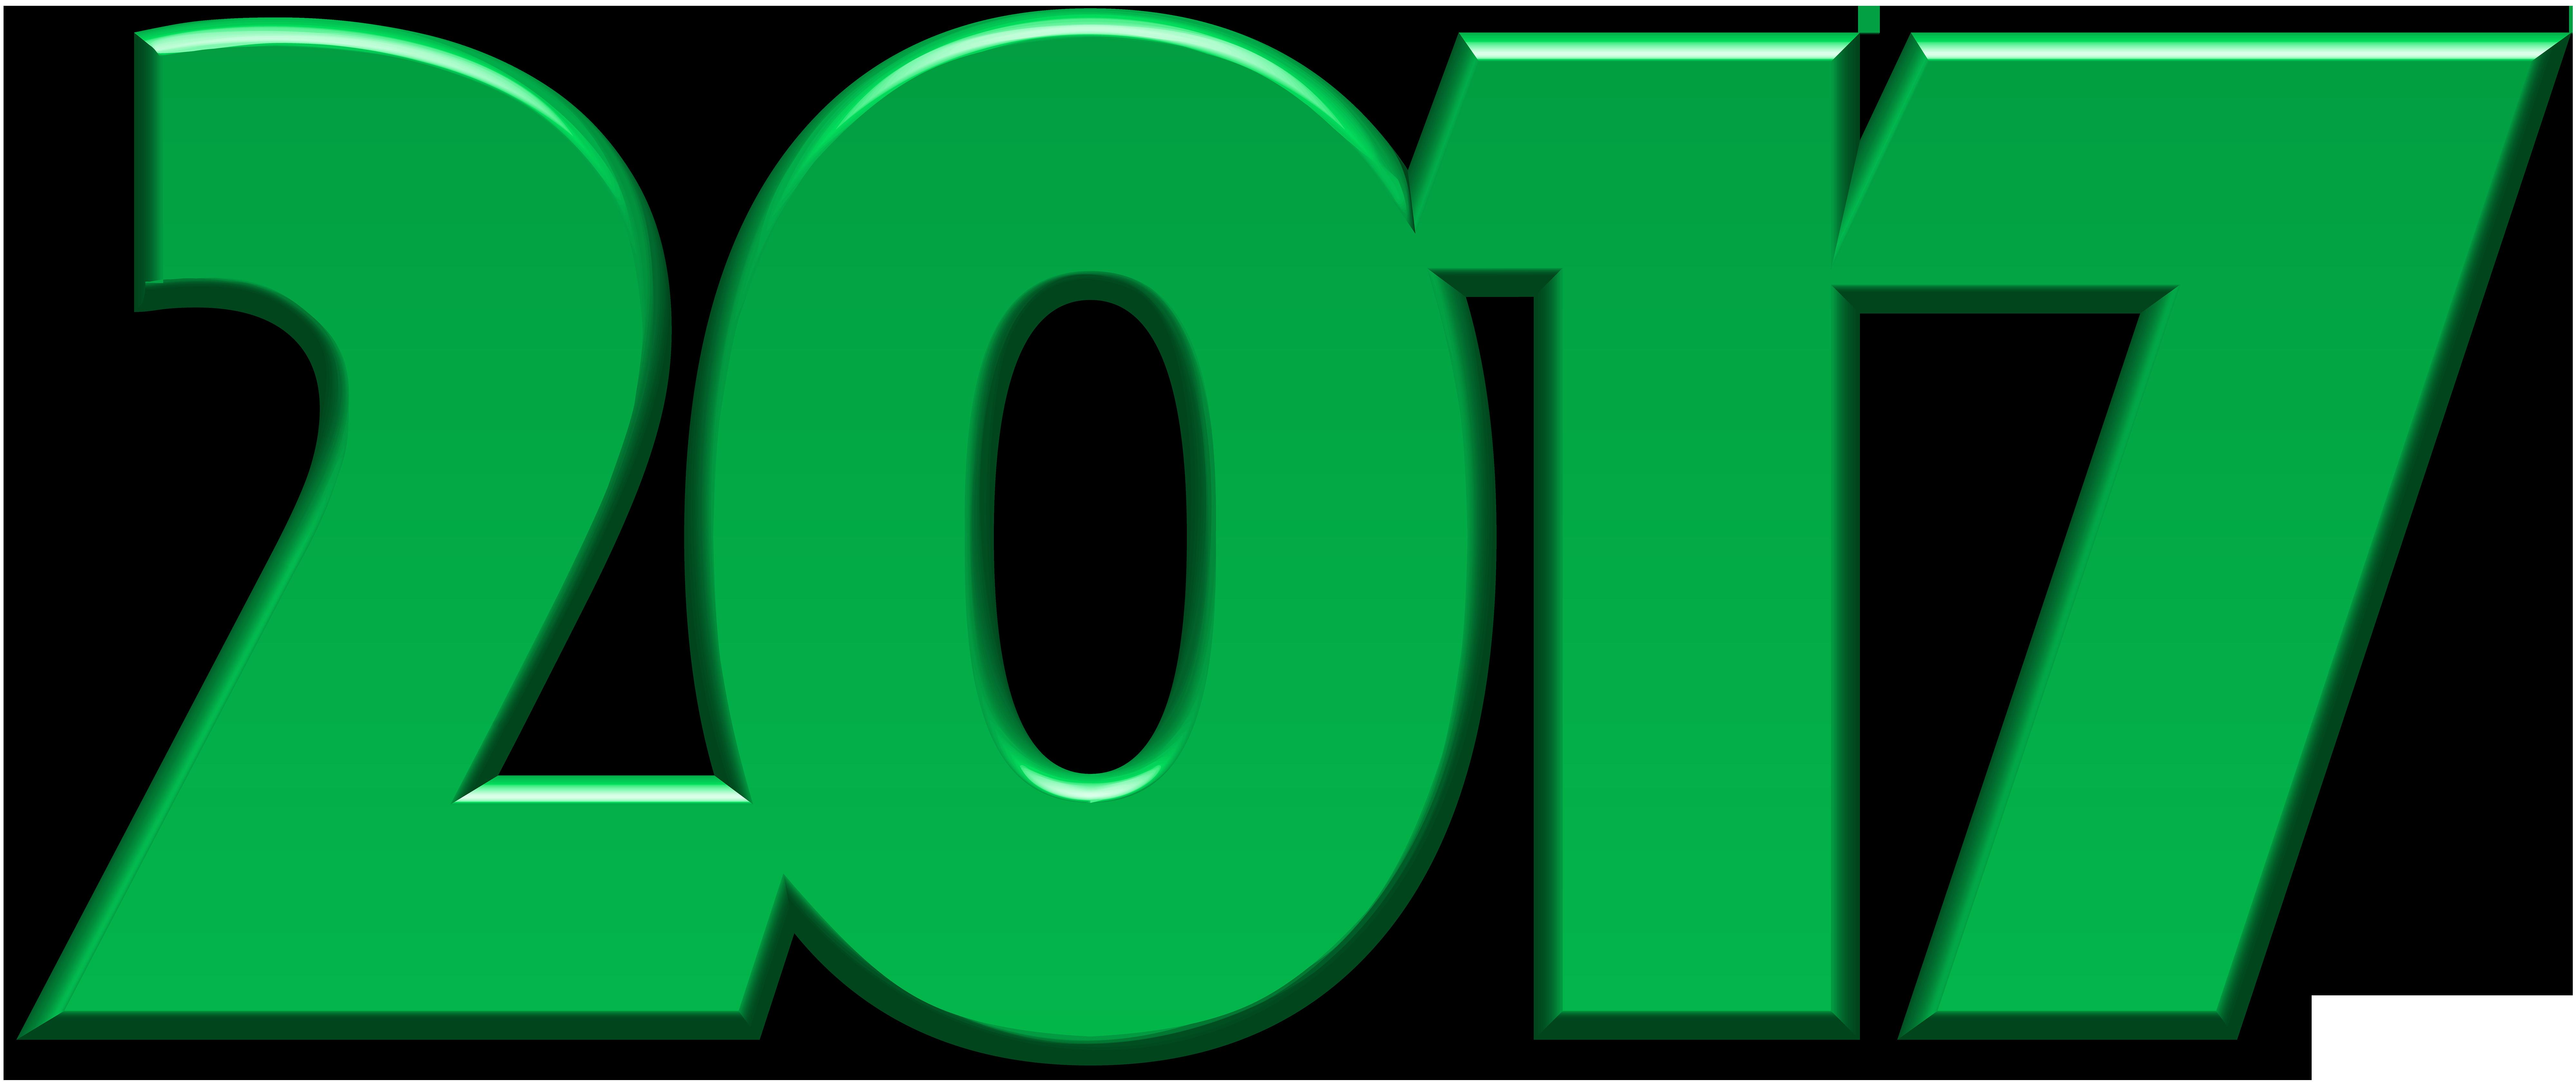 8000x3359 2017 Green Png Clip Art Image Png Image Art Images